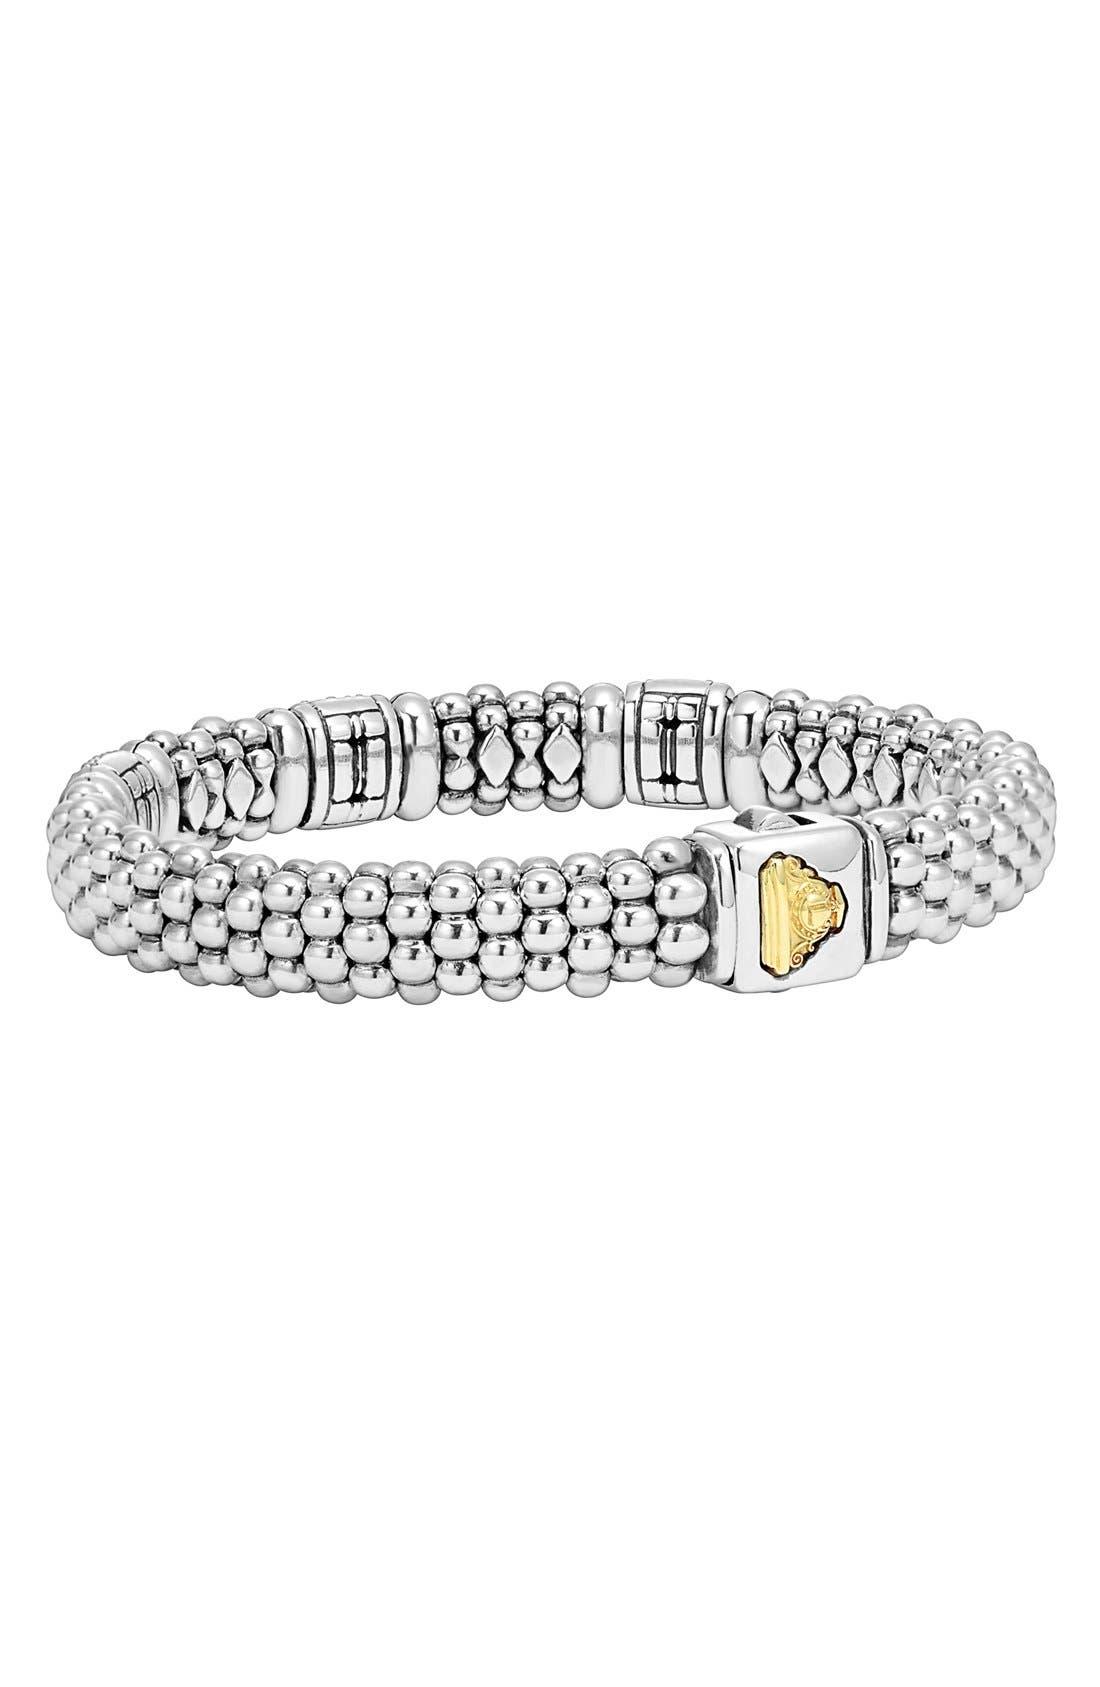 'Caviar' Diamond Station Bracelet,                             Alternate thumbnail 4, color,                             SILVER/ GOLD